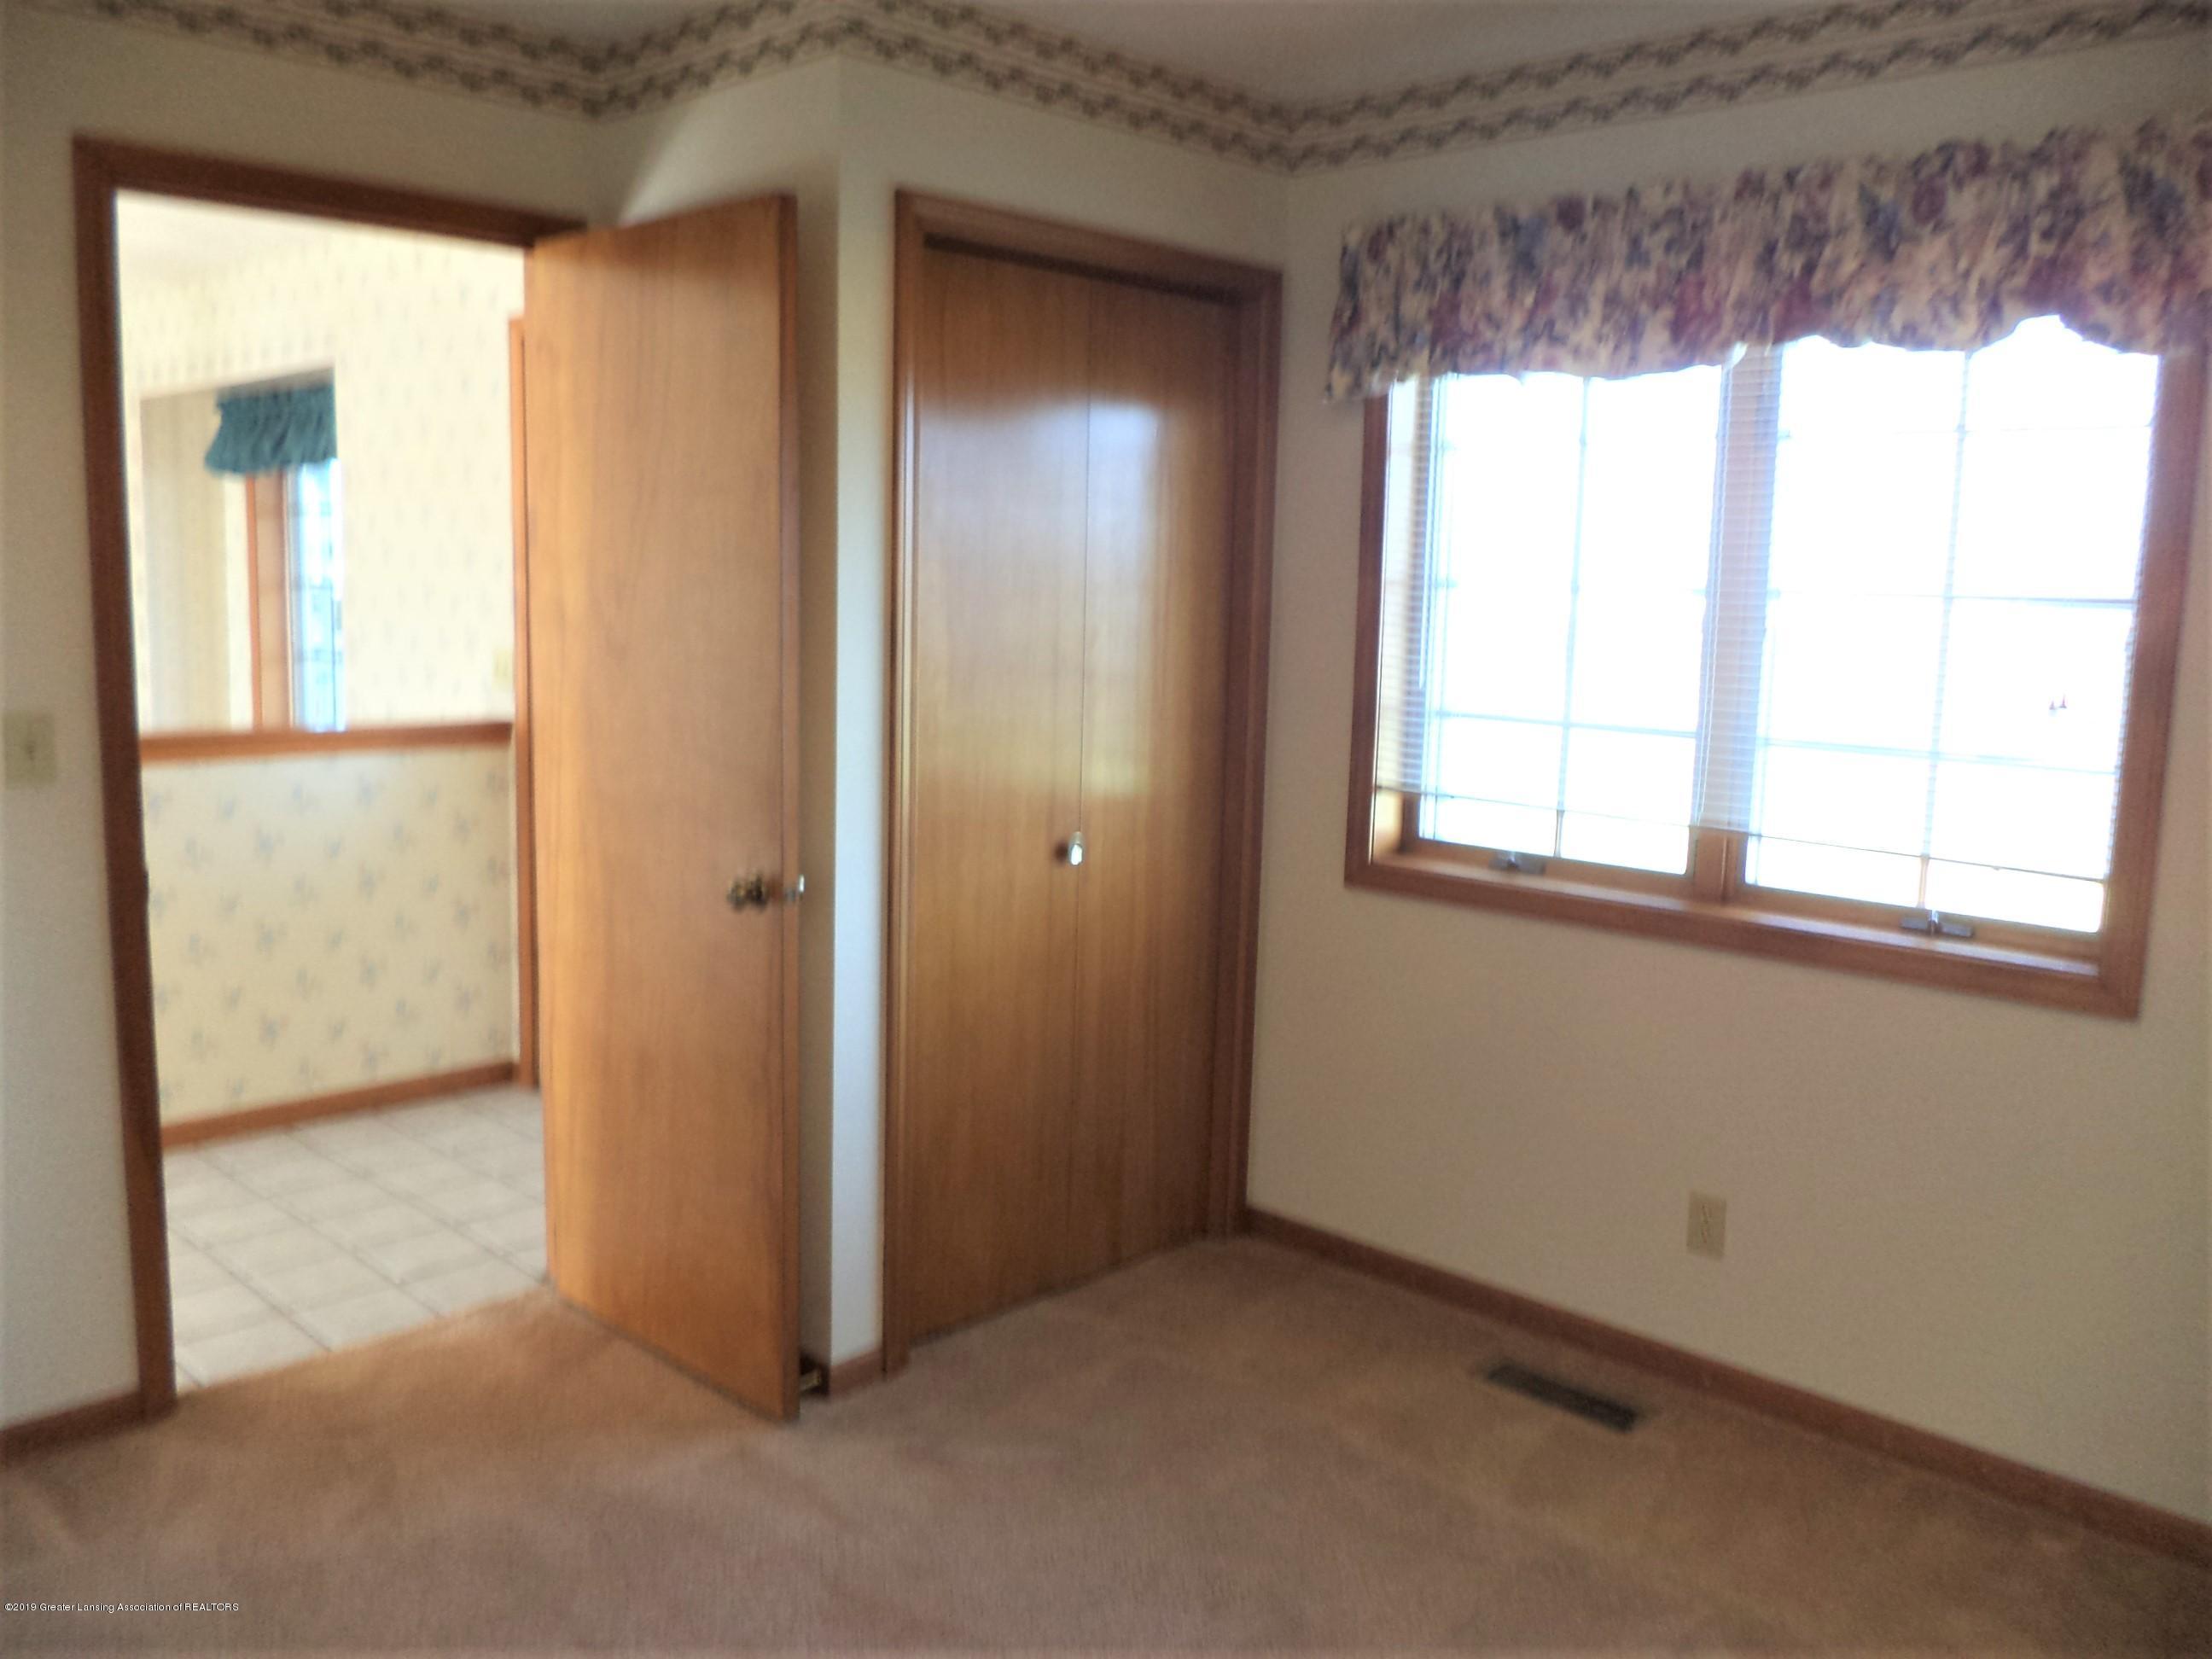 5535 W Parks Rd - Bedroom 1 - 16